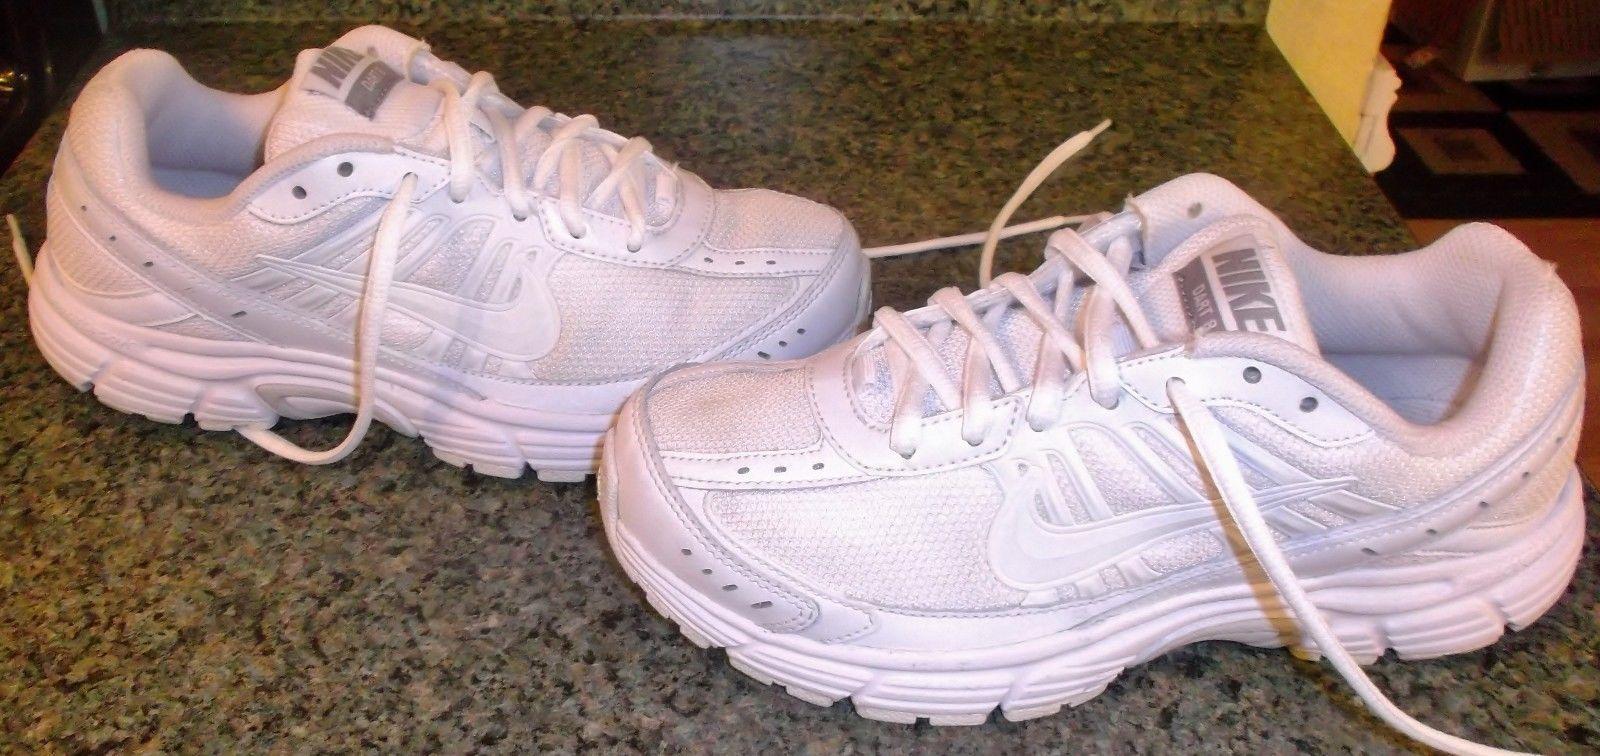 Piovoso disinfettare astronauta  Nike Dart 8 Impact Groove women's athletic shoes Size 6.5 Medium | Womens  athletic shoes, Geometric shoes, Athletic shoes